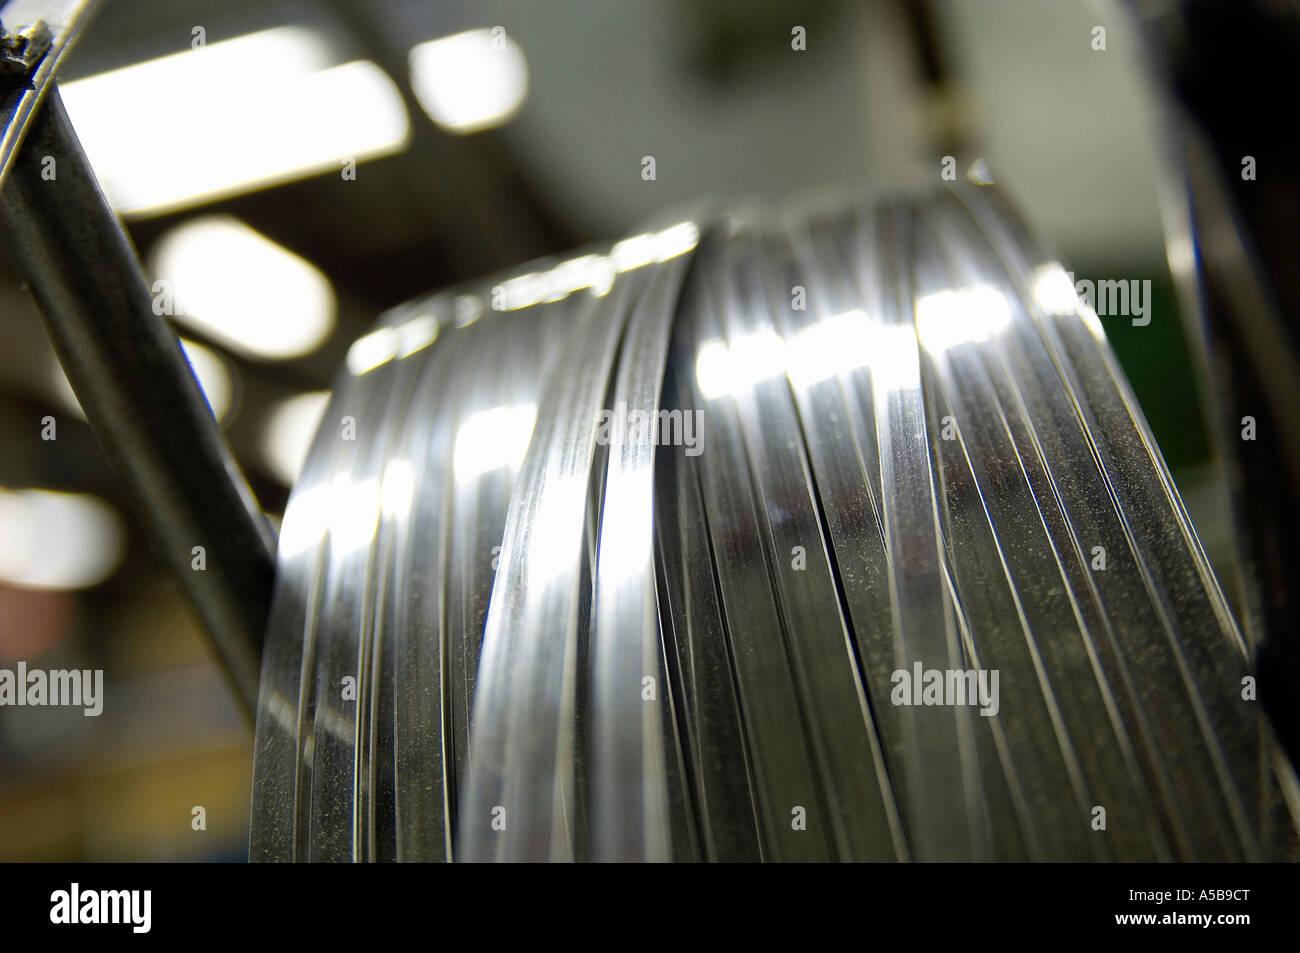 Long thin metal on spool. - Stock Image